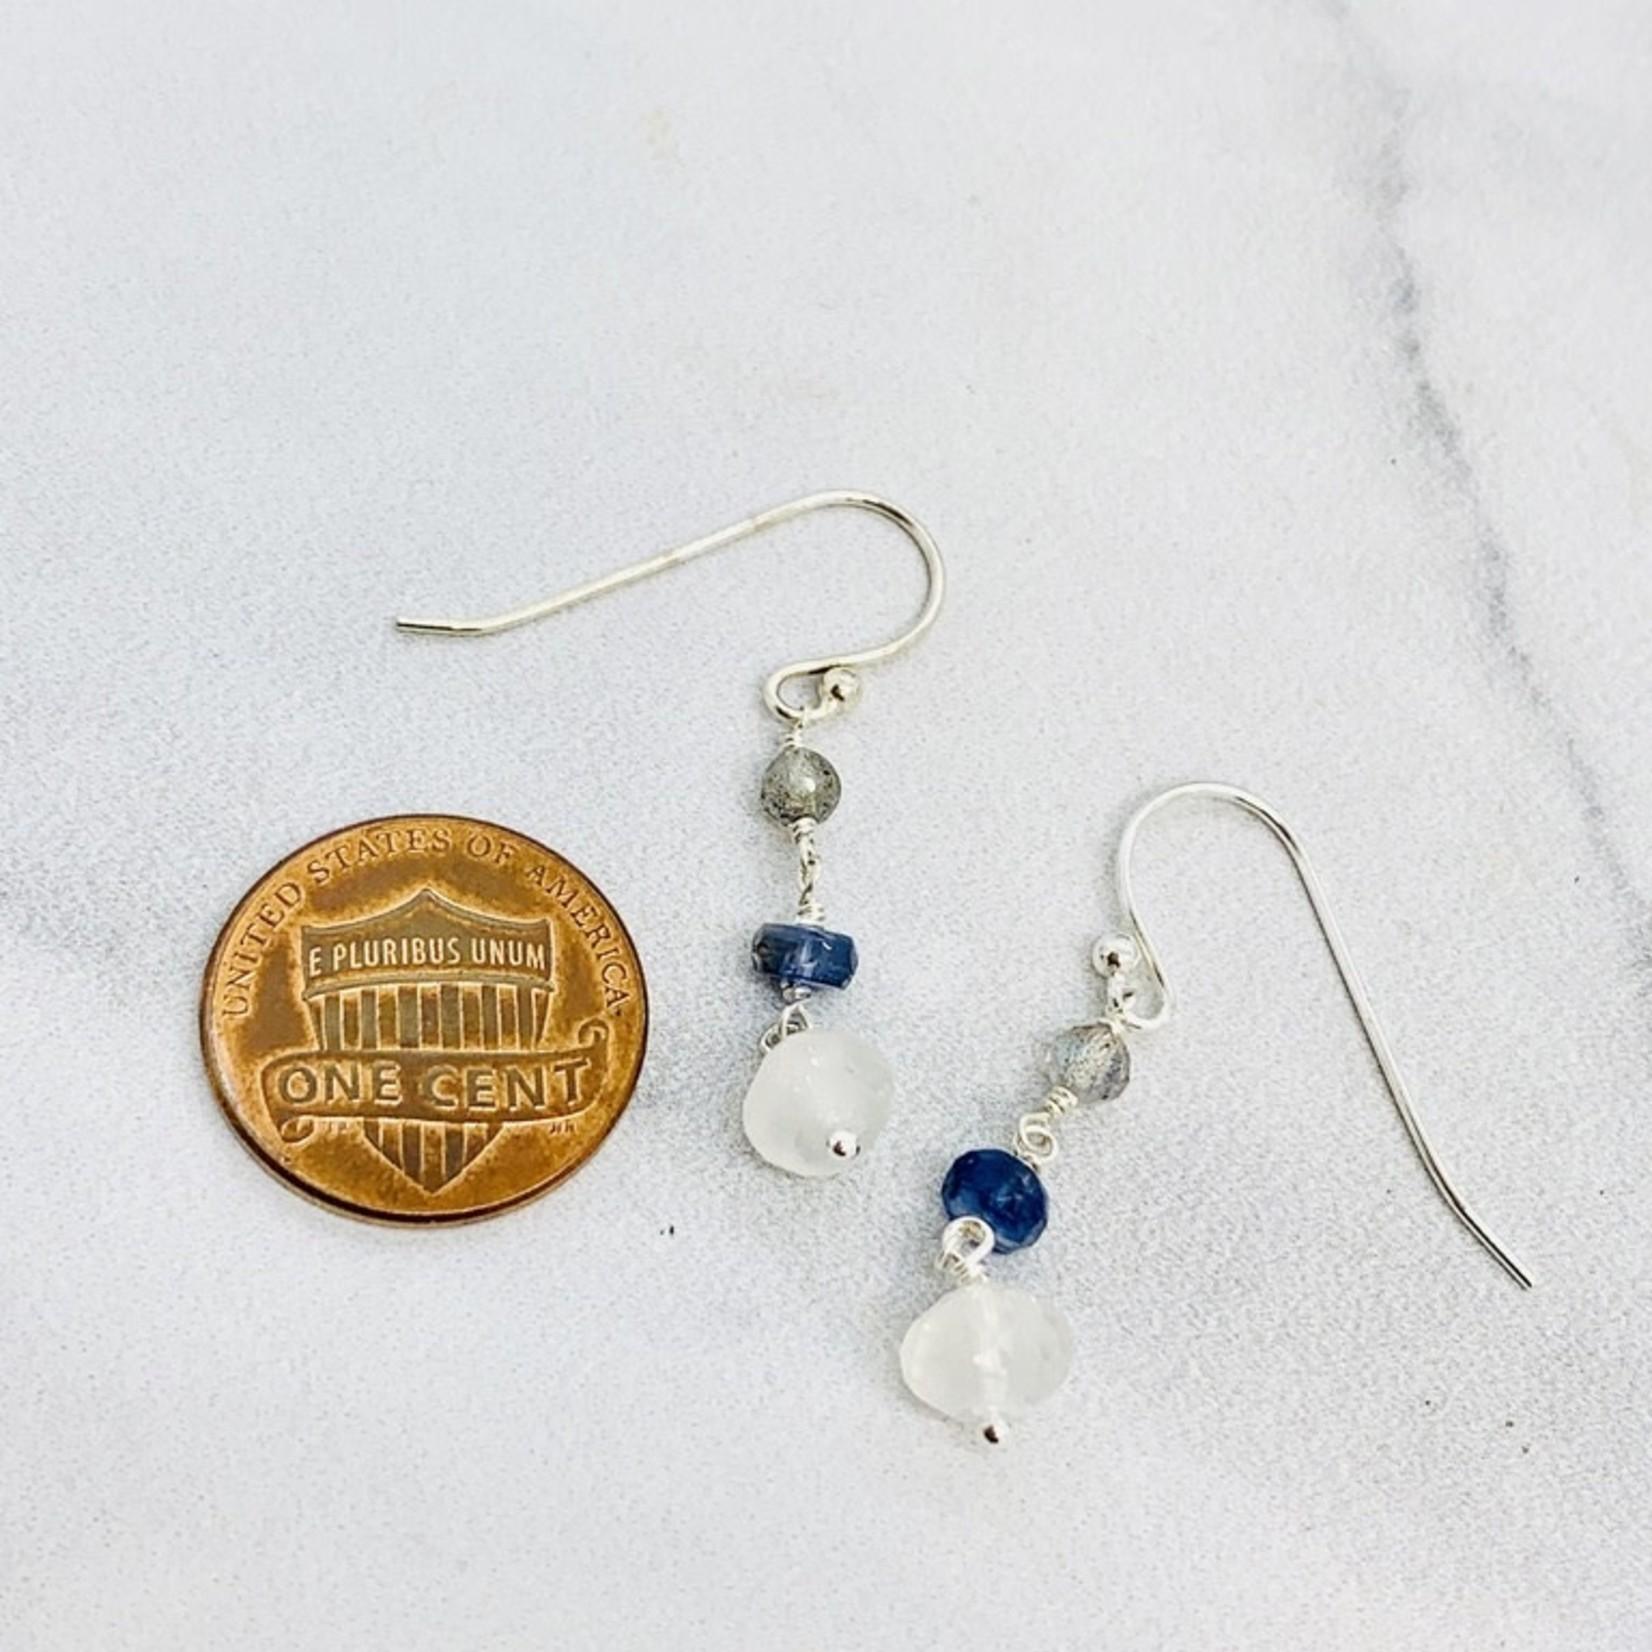 Handmade earrings with connected descending labradorite, kyanite, rainbow moonstone